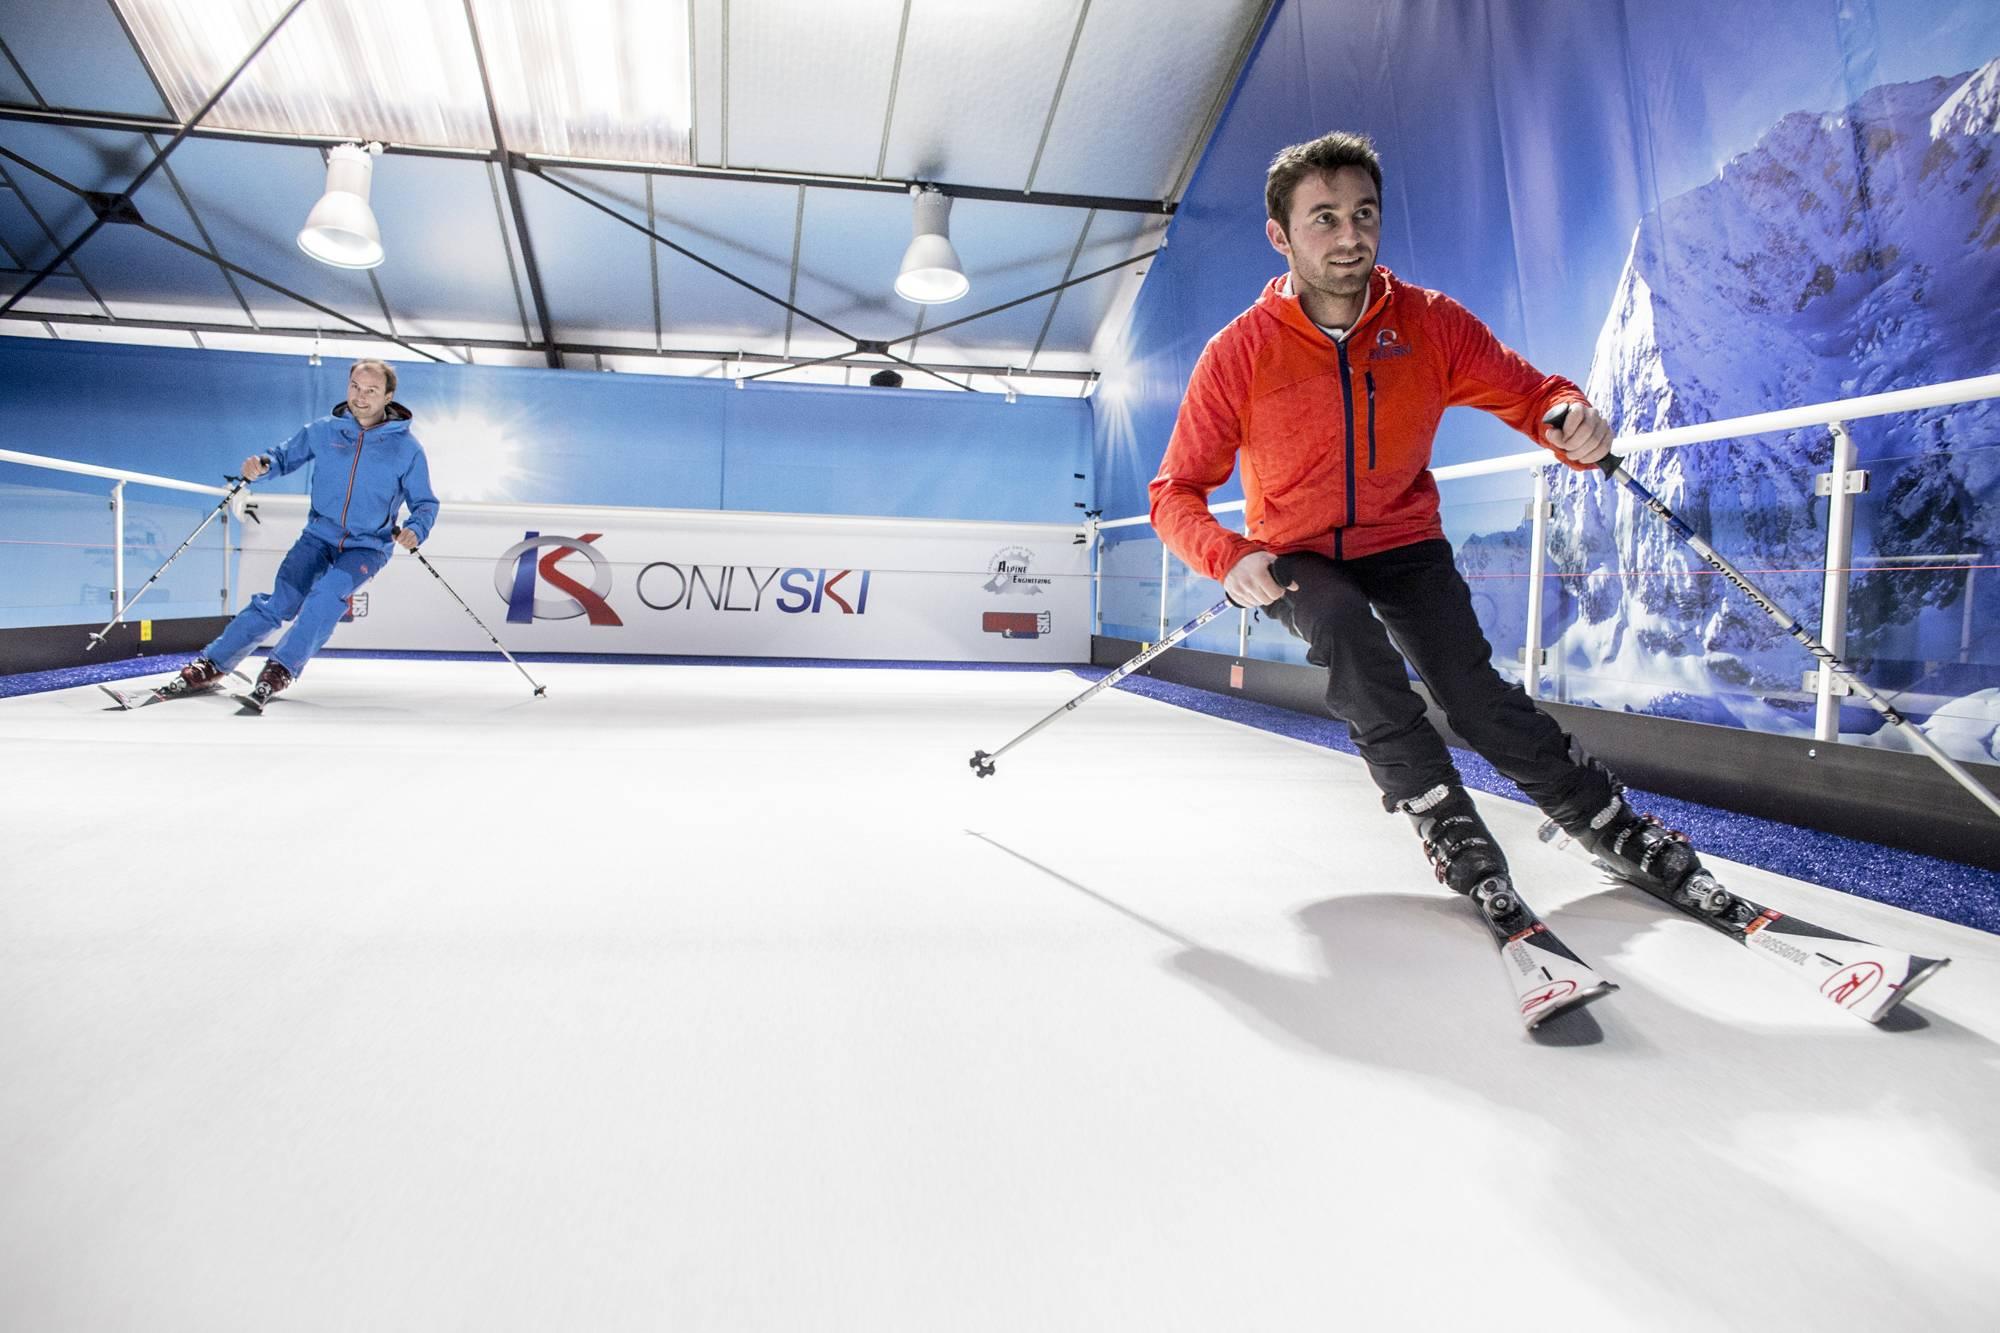 skier toute l'année à lyon